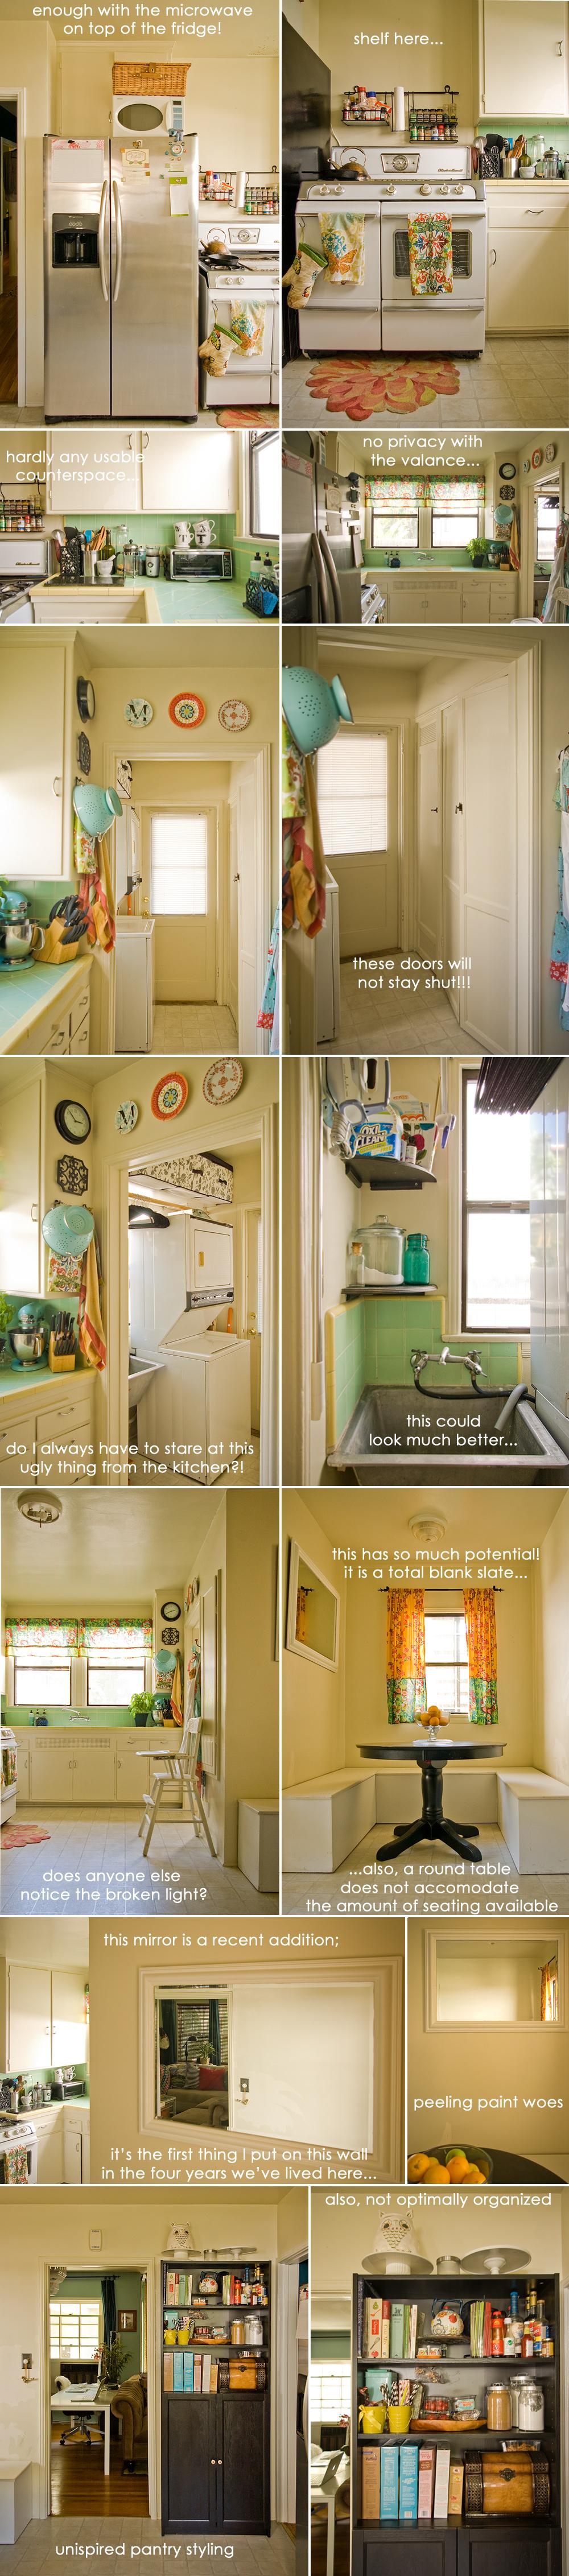 kitchen_before_collage